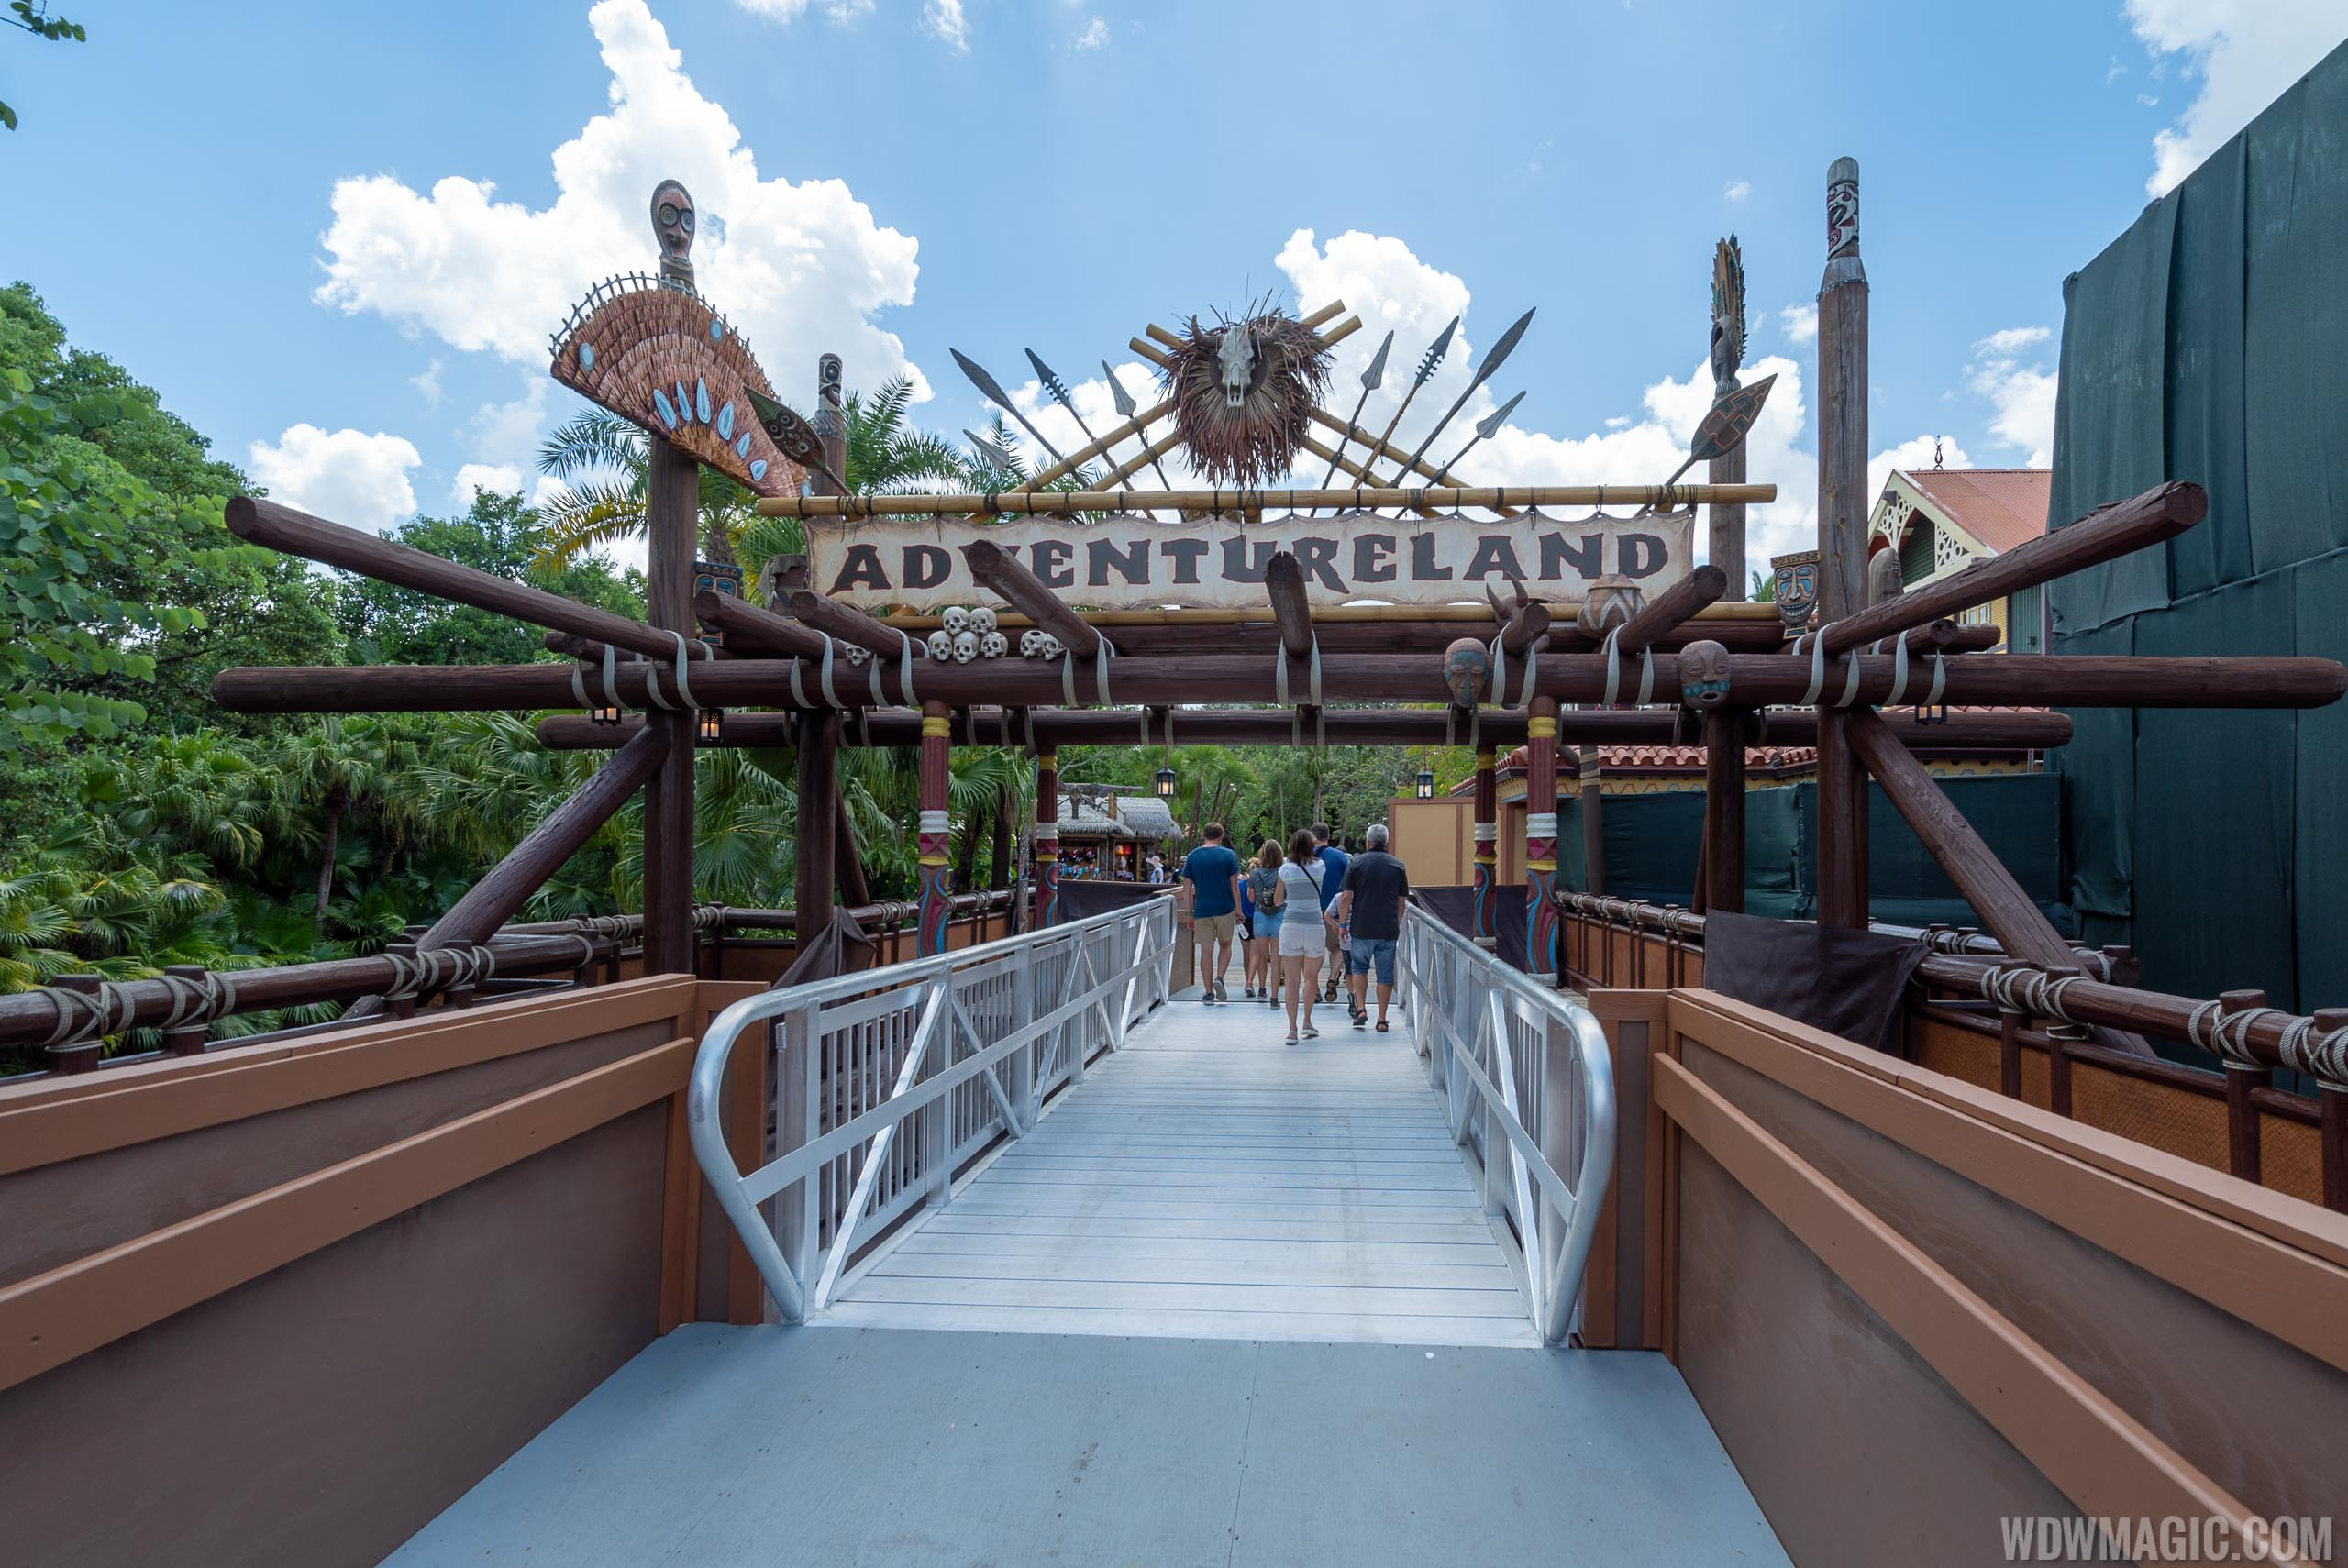 Club 33 location and bridge under construction in Adventureland at the Magic Kingdom